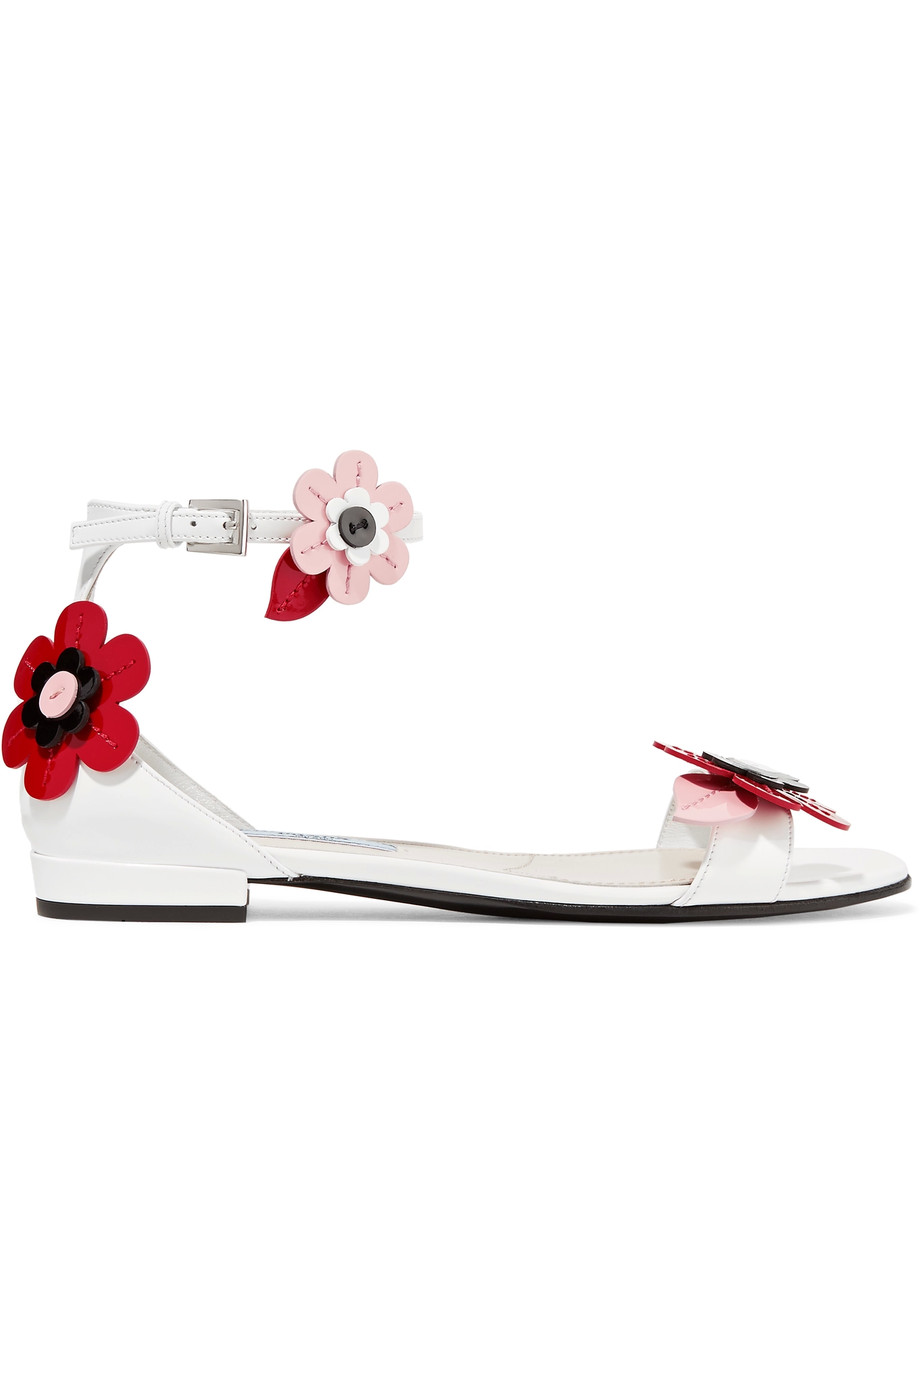 #PopbelaOOTD: Flower Power! Tren Floral yang Masih IN